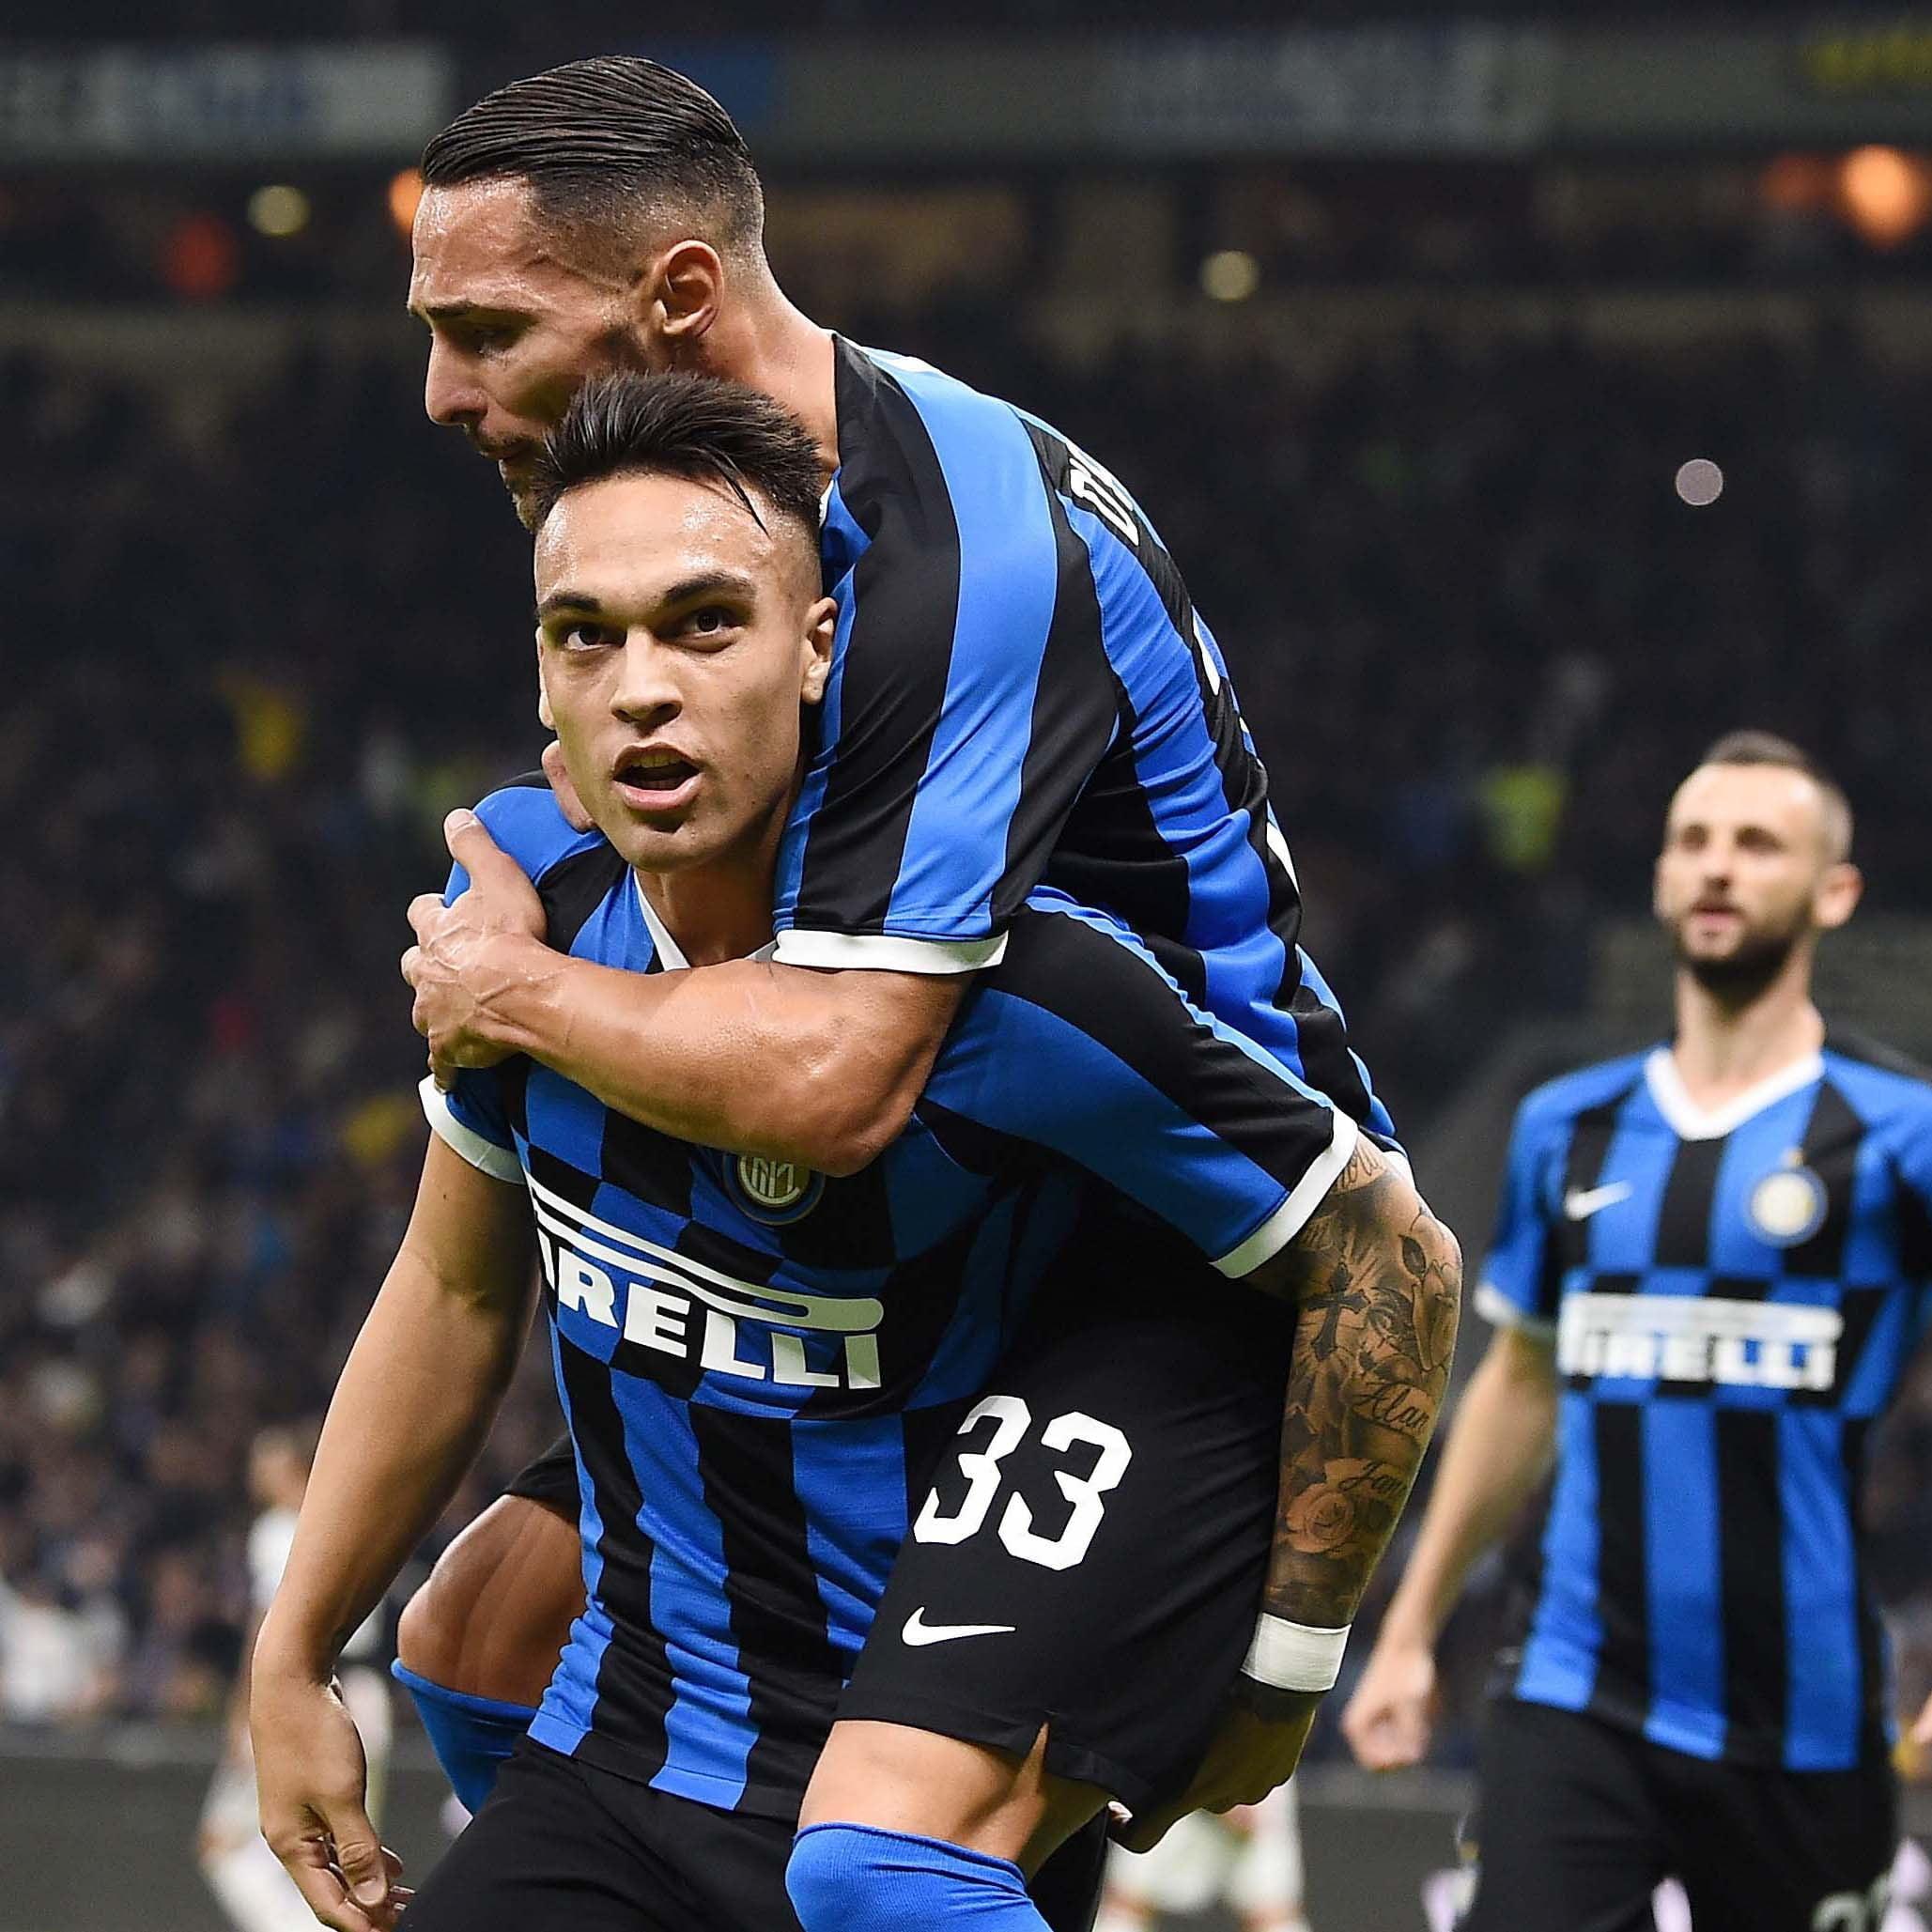 Inter Milan - SSC Napoli (zo. 21 november 2021)